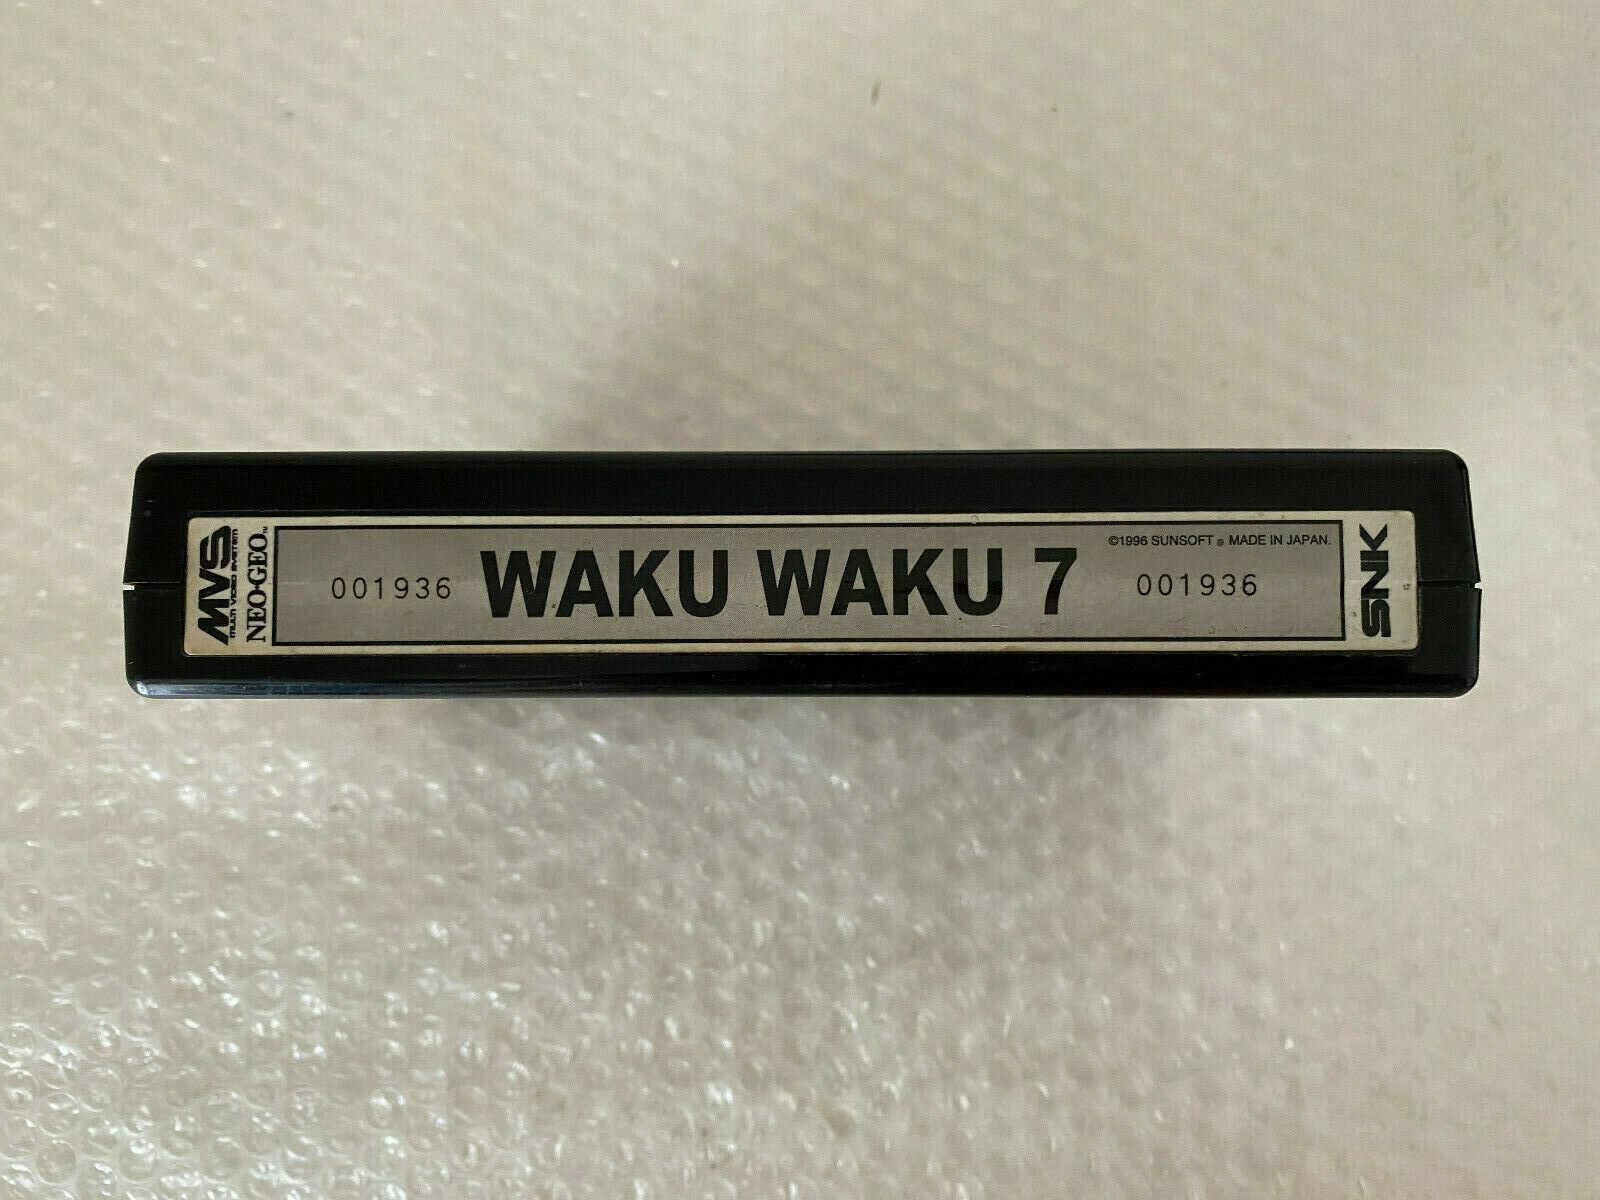 Snk Neo Geo WAKU WAKU 7 Mvs Hollographic Label Nmint condition 100% original